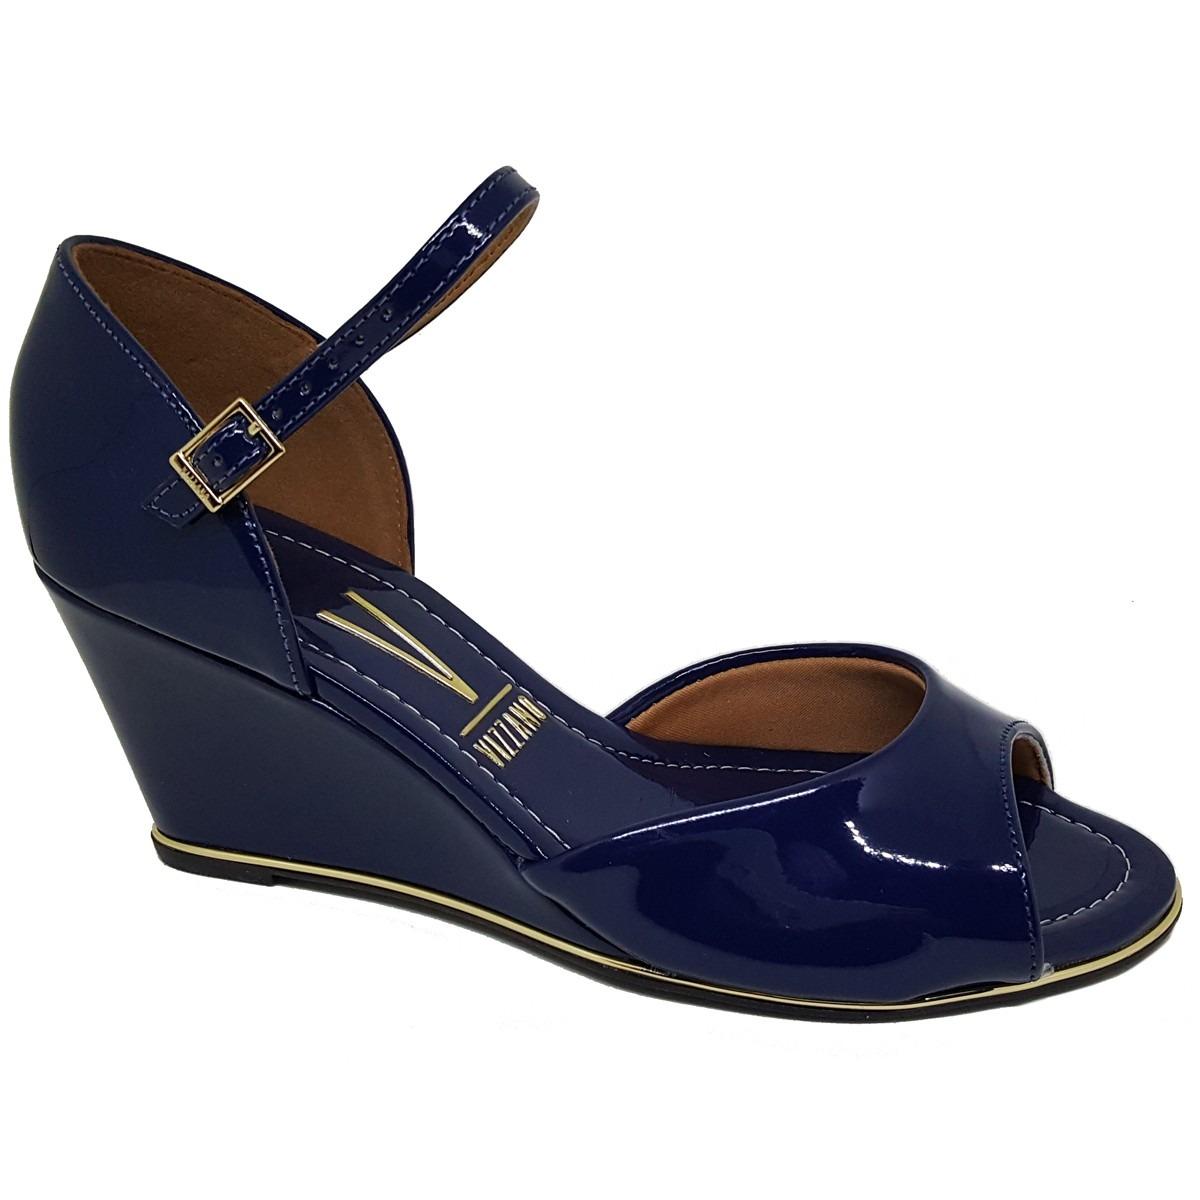 eef5f0289 Sandália Vizzano Anabela Azul Marinho - 6271.111 - R$ 120,00 em ...